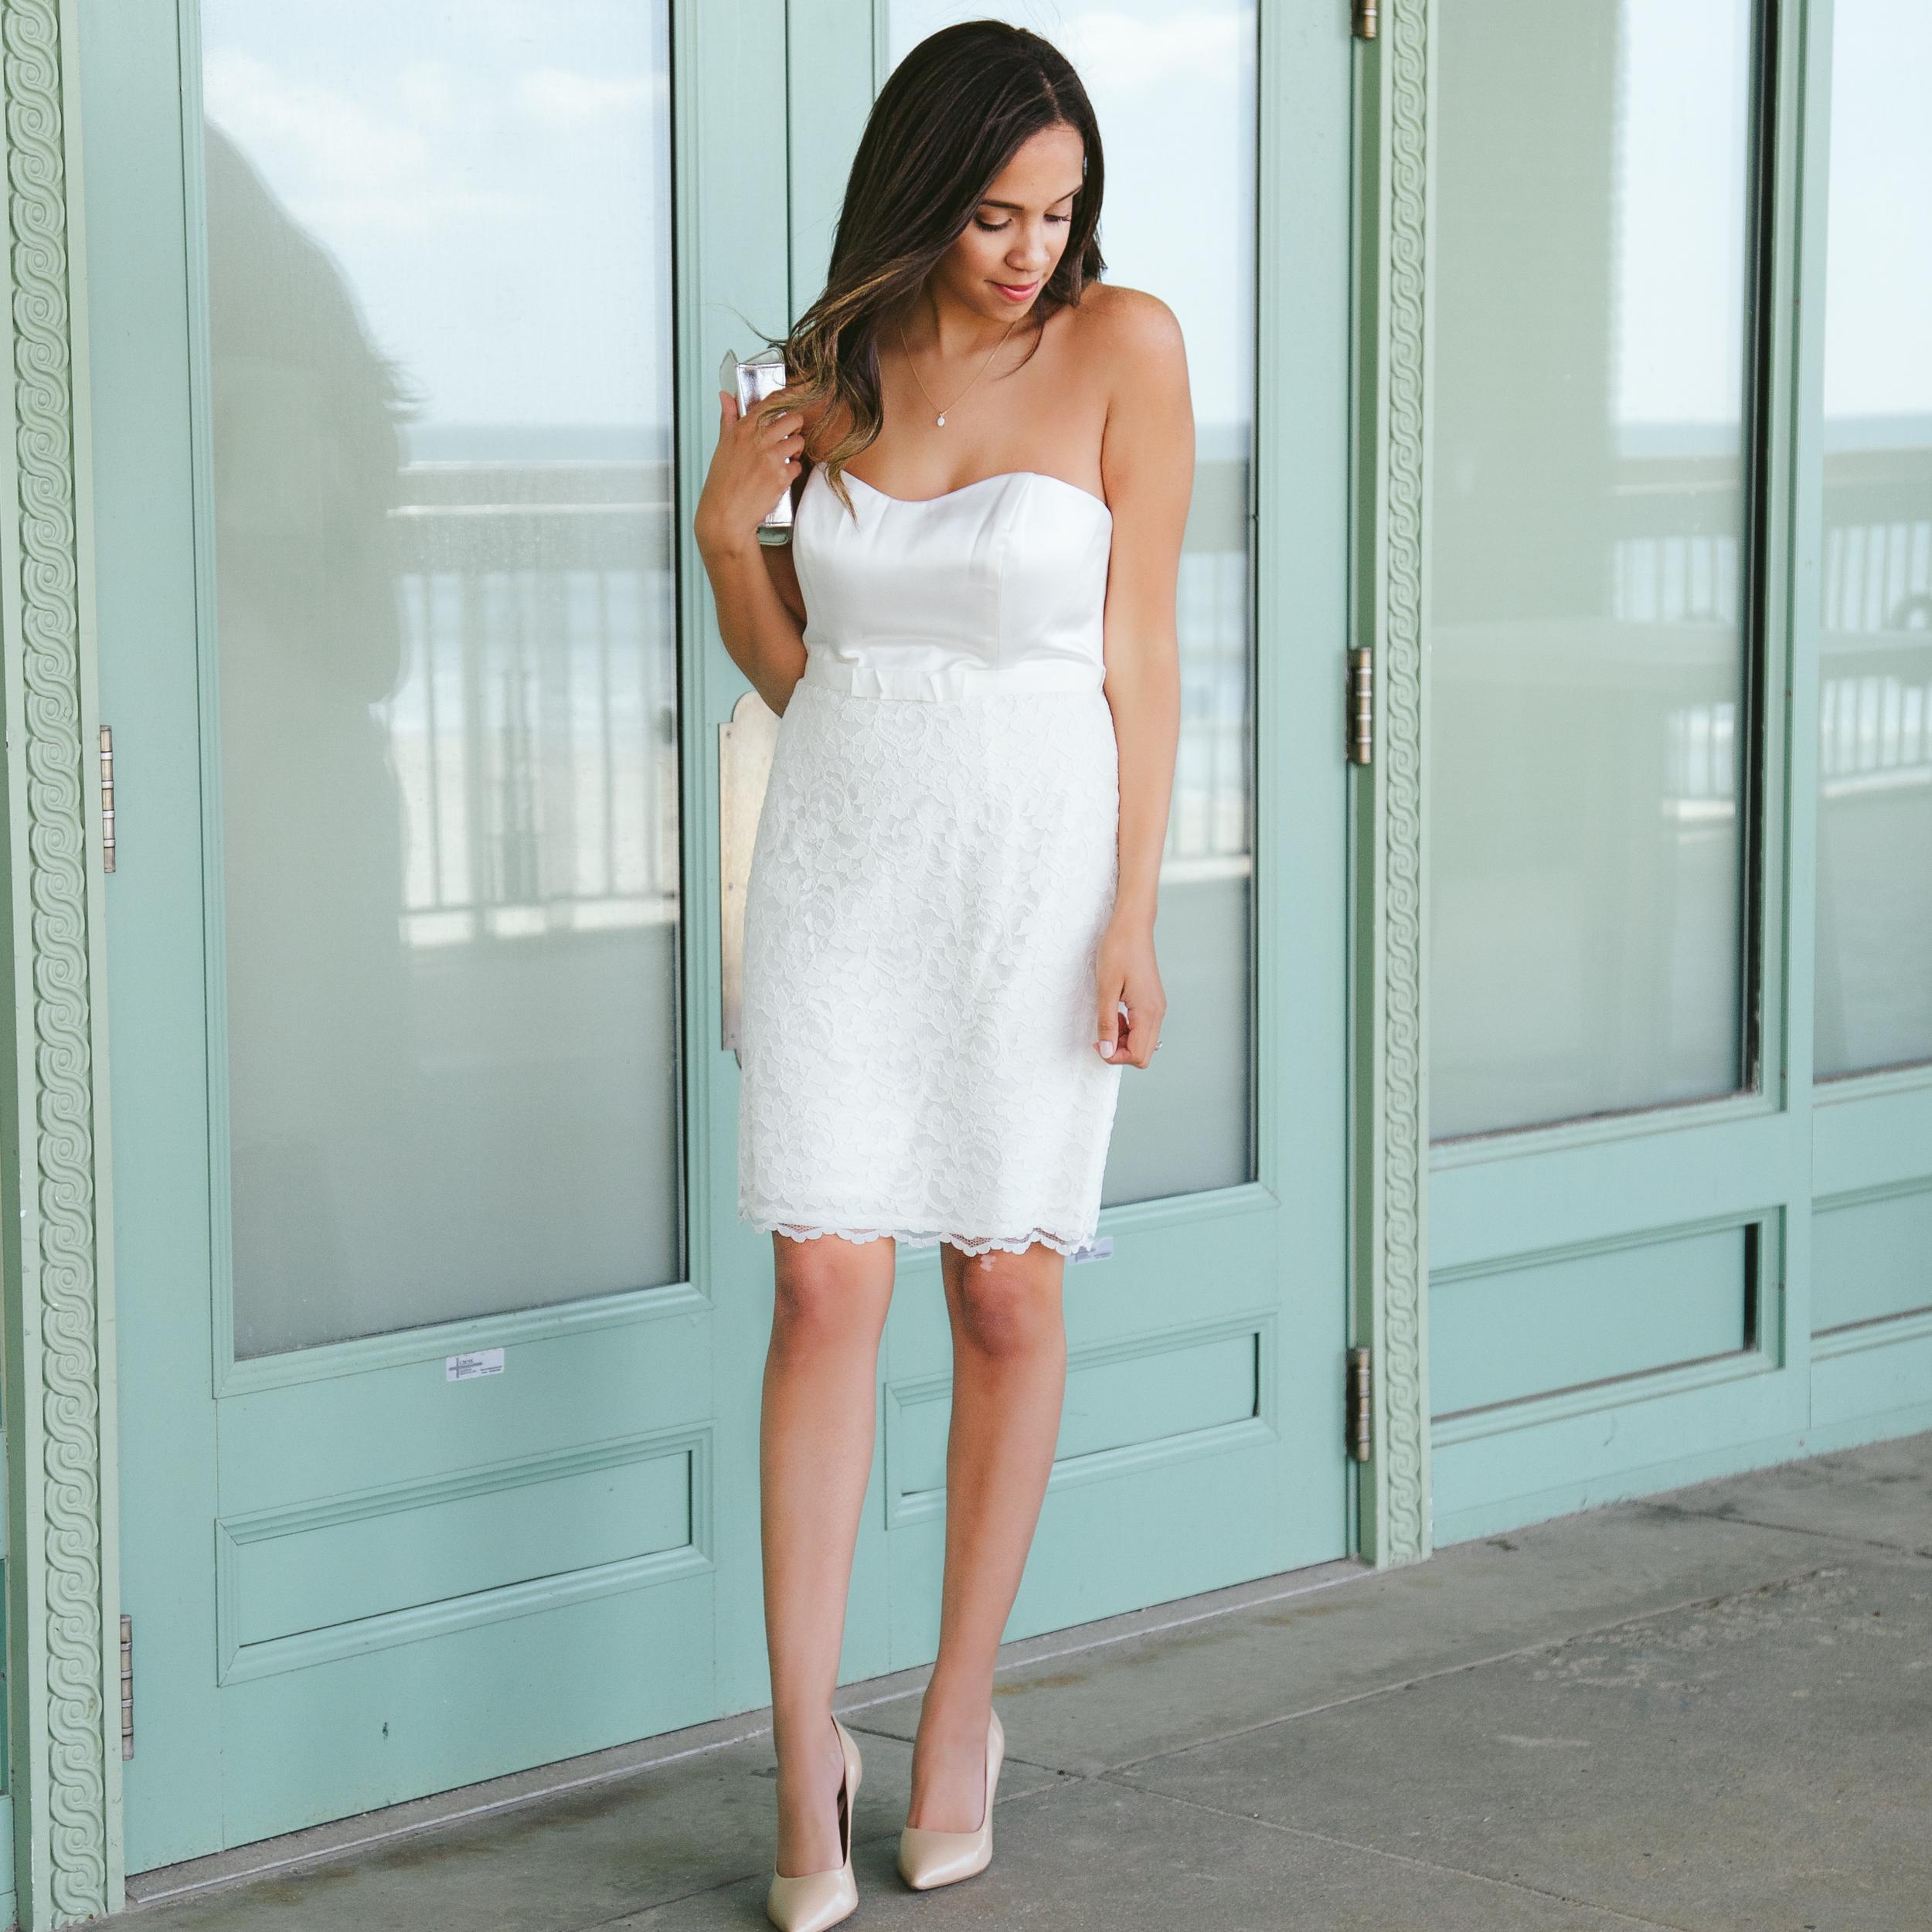 b6b14a227aa3 Little White Dresses Perfect for Bridal Celebrations — Alexandria haddad